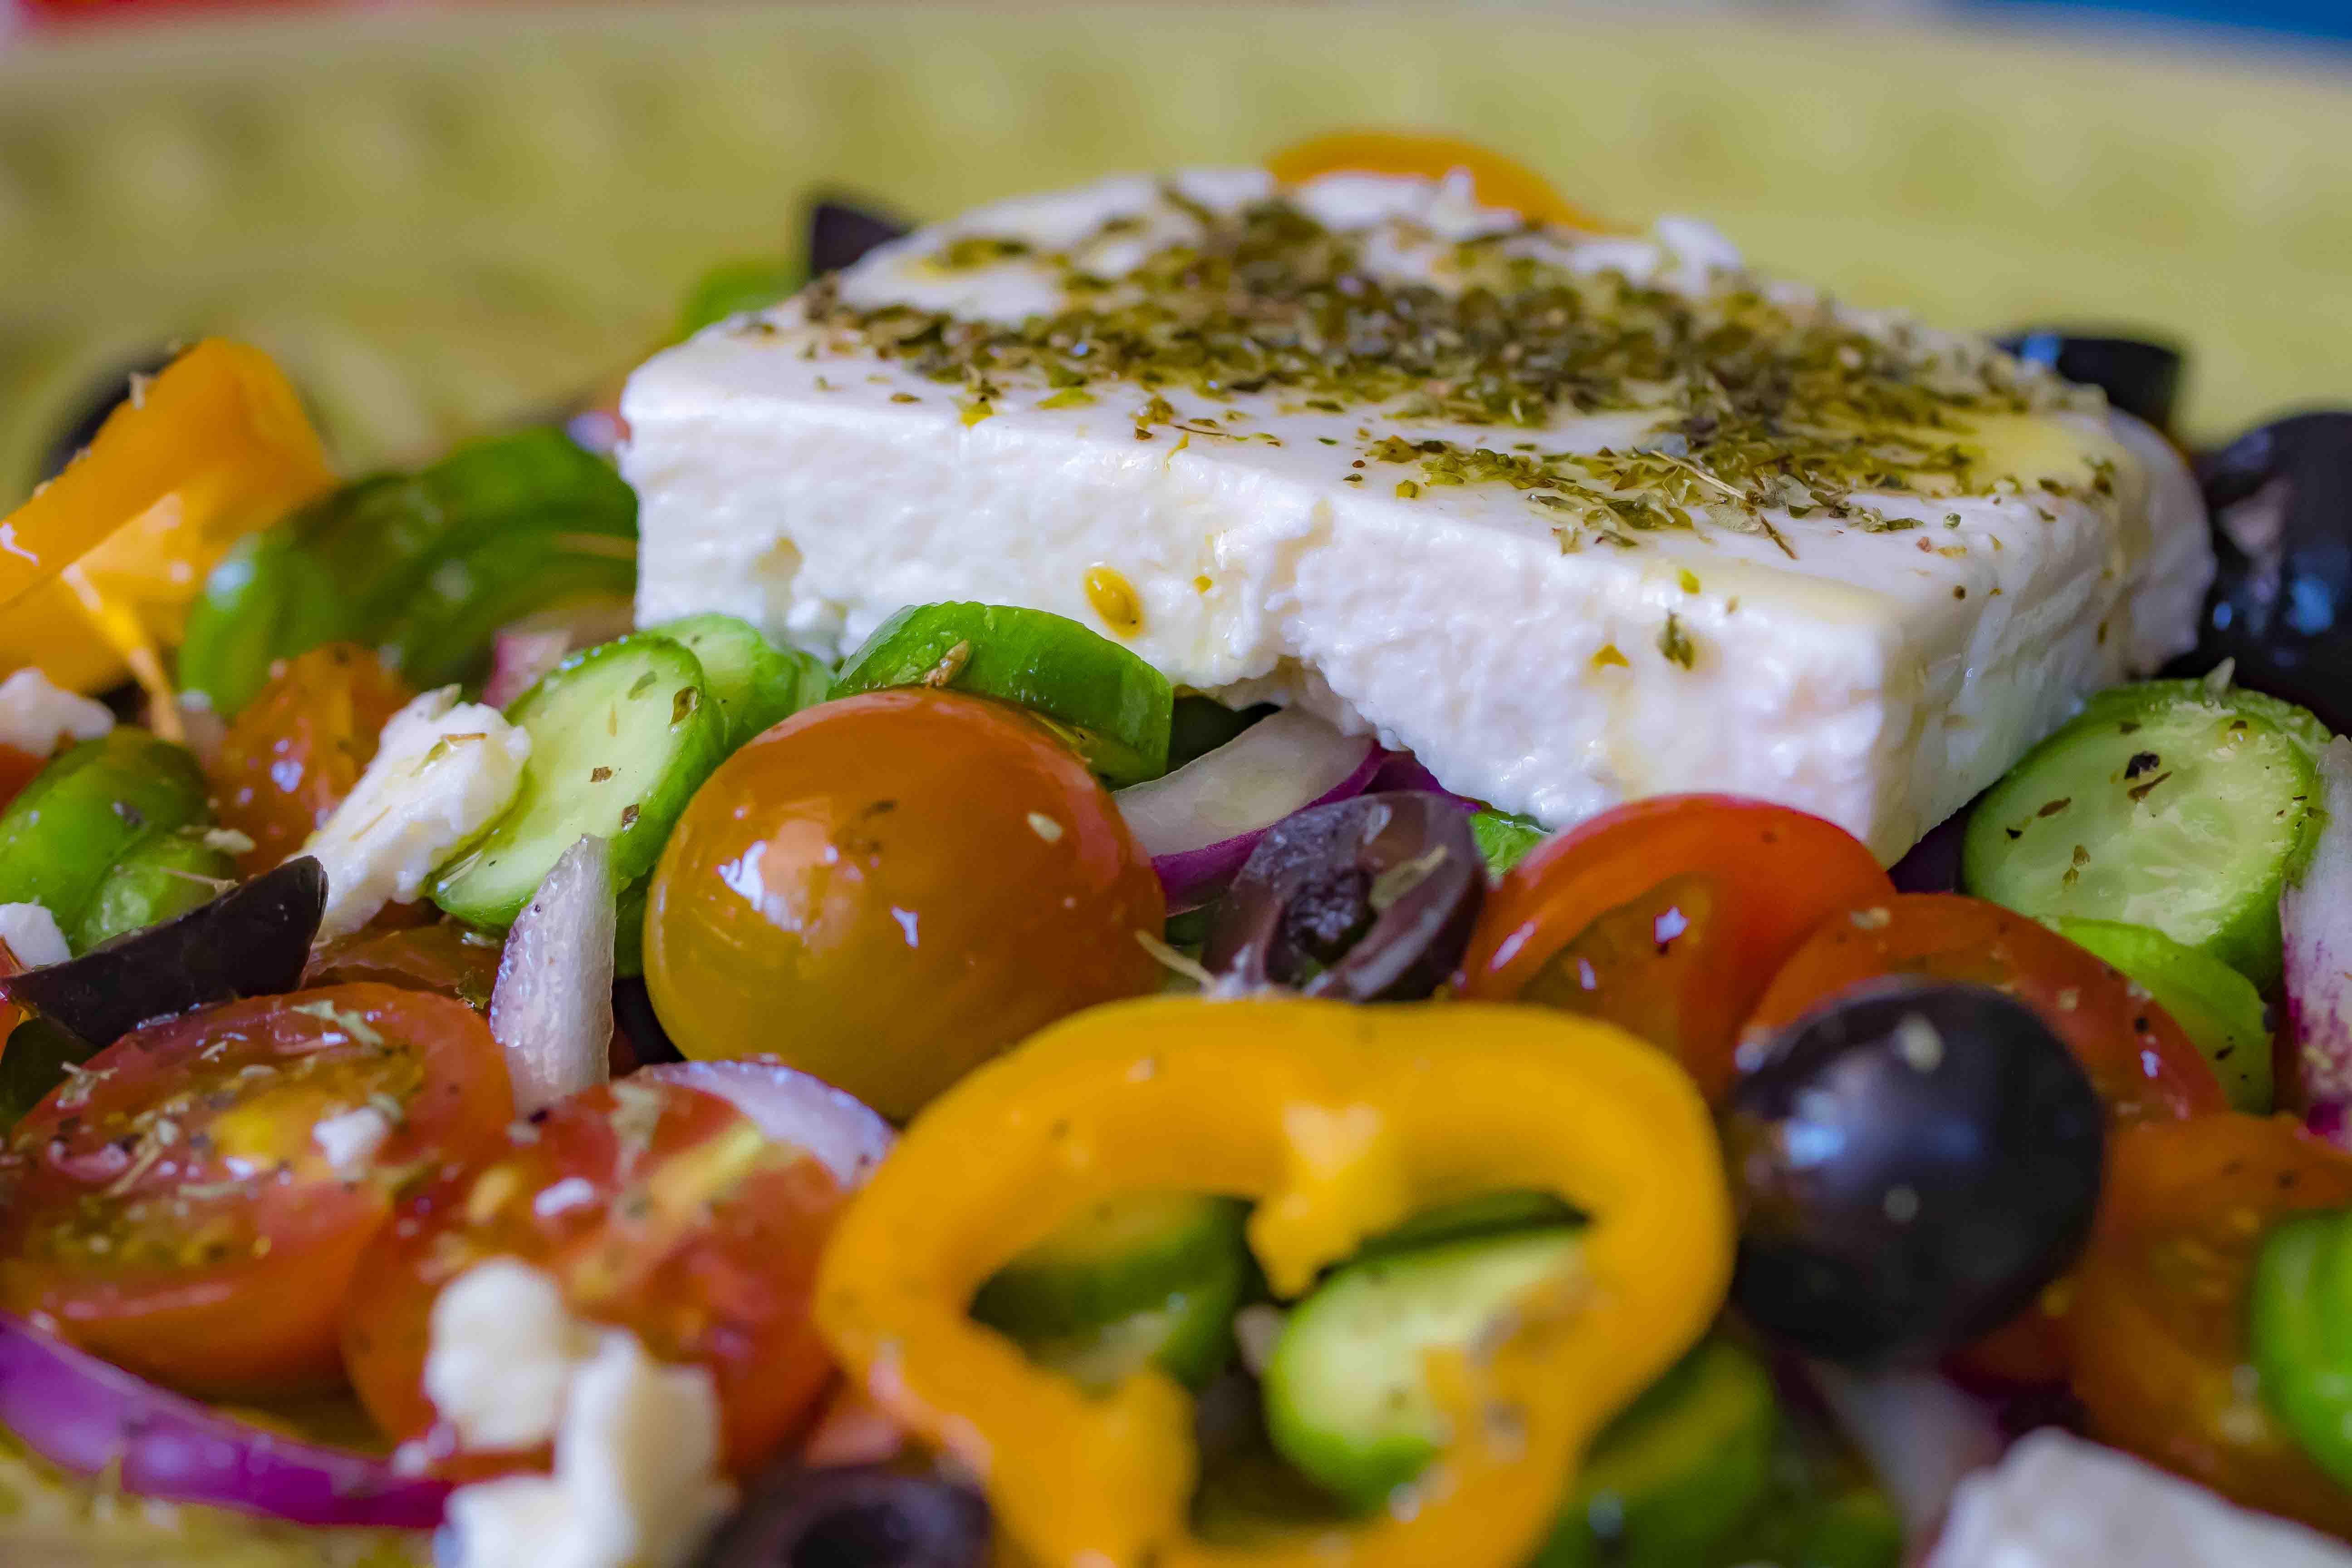 Magnifiek Griekse salade met gele paprika - Secretos Del Sur @LG96